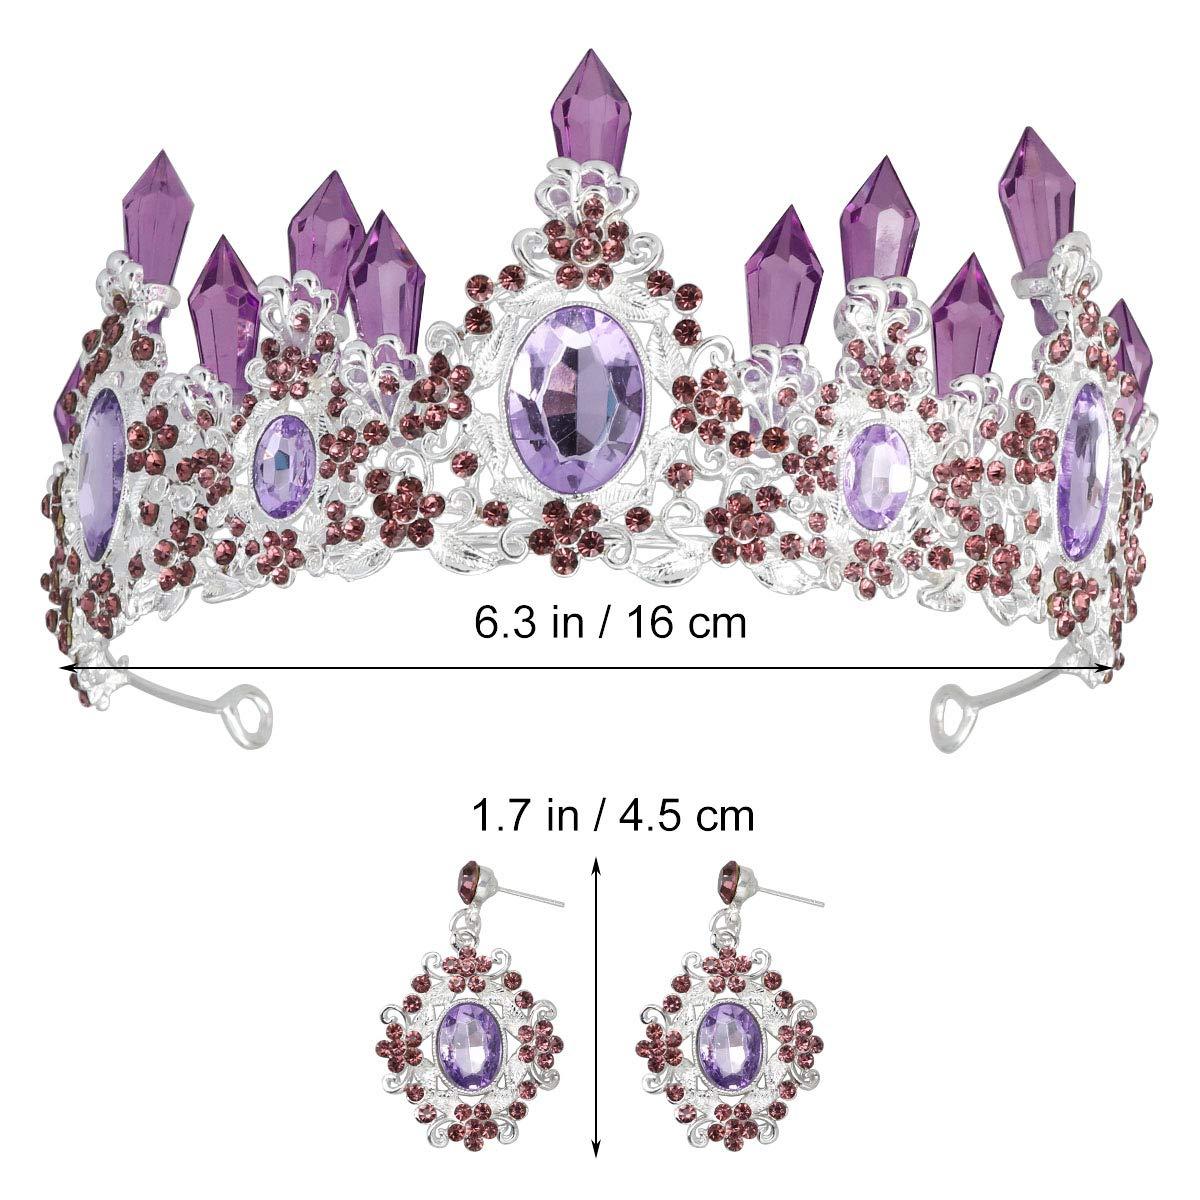 Tiara Crown Crystal Crown Bridal Noble Tiara Magnificent Rhinestone For Princess Wedding Jewelry Set (Purple)